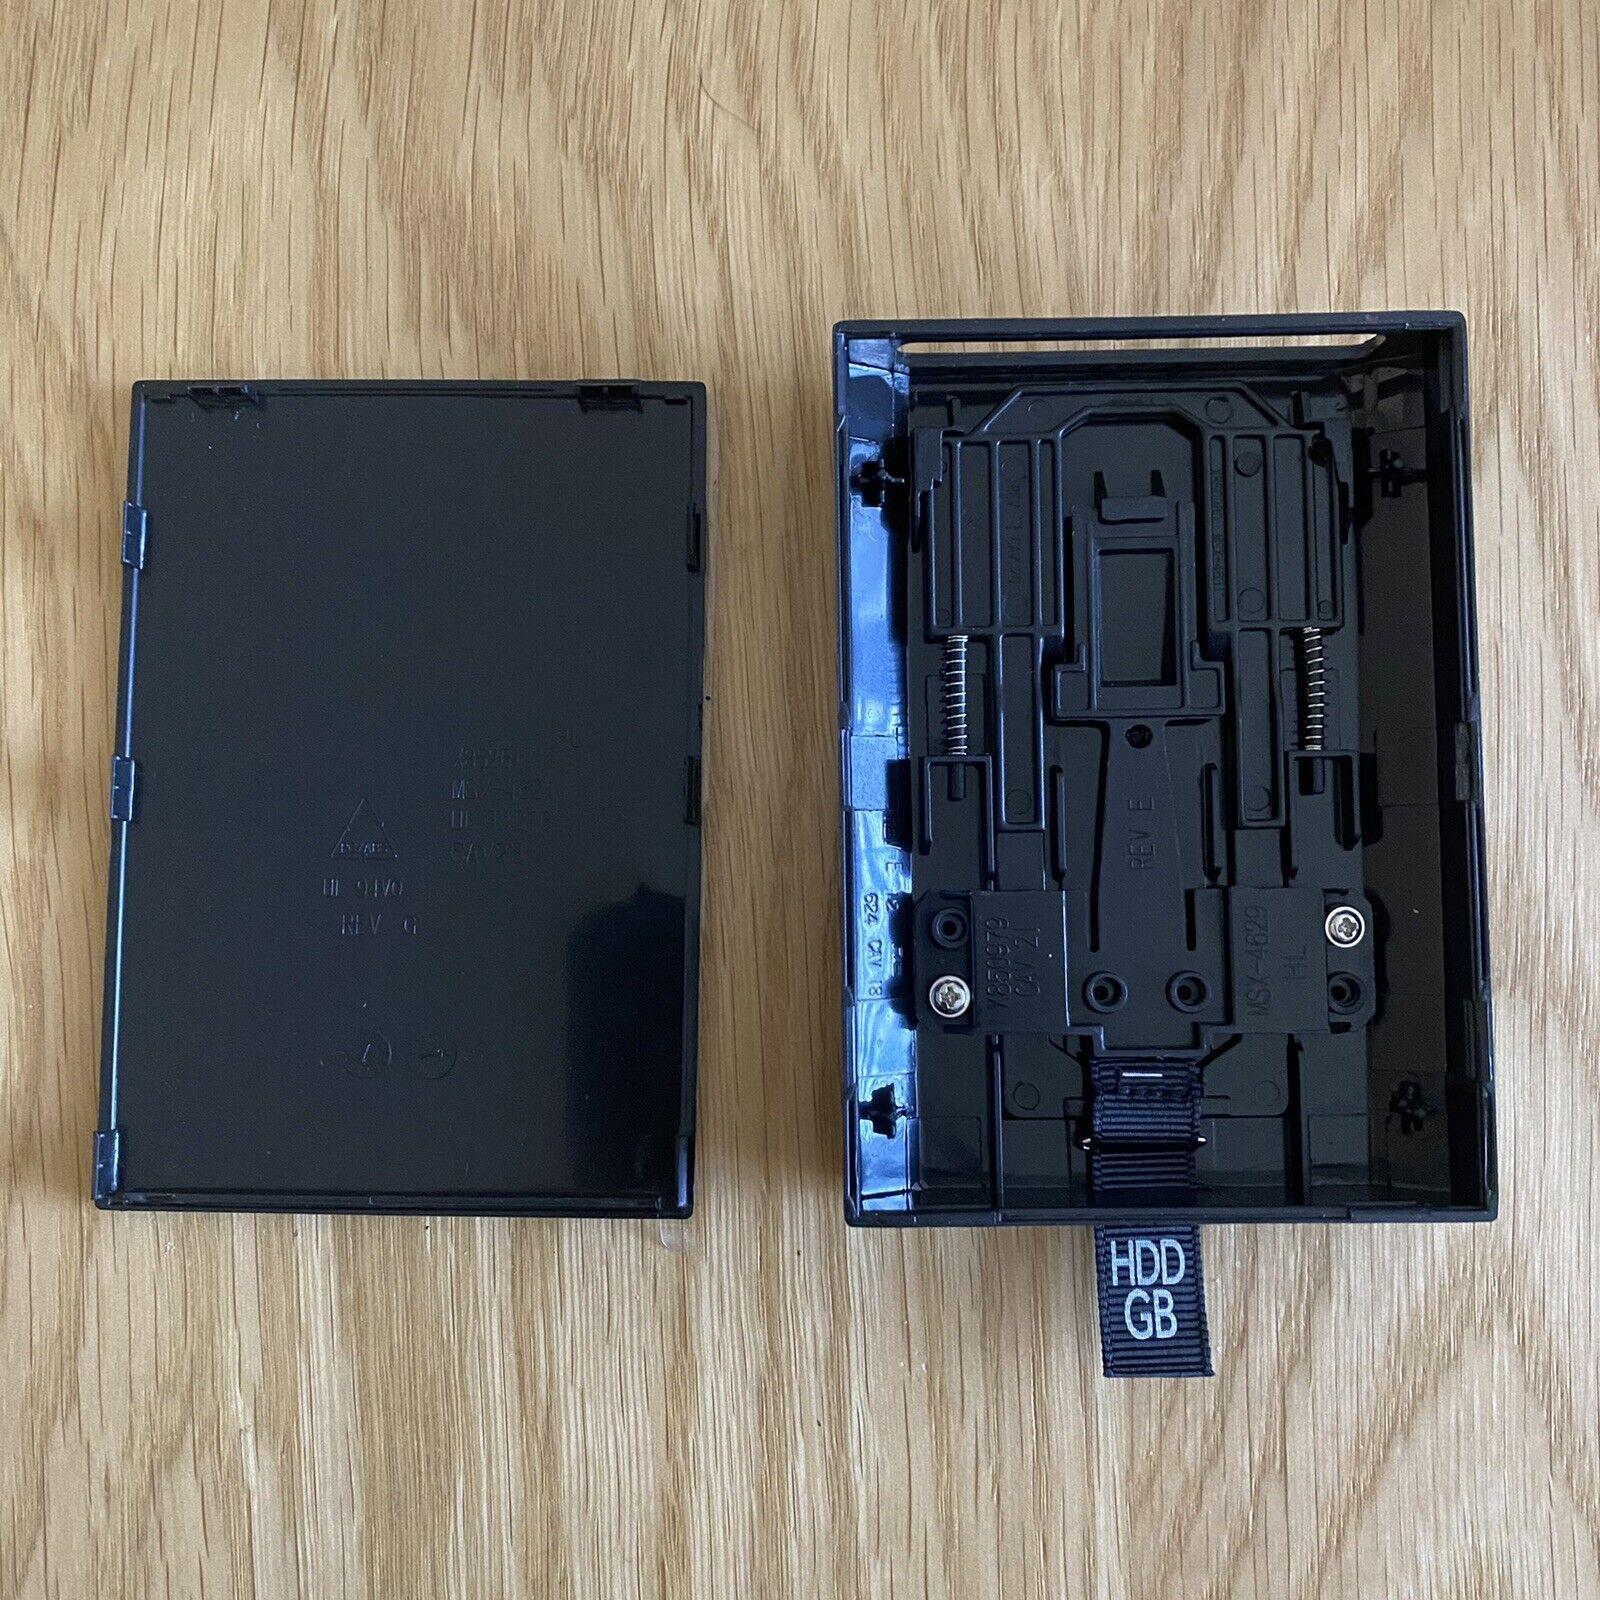 2.5 Sata Hard Drive Enclosure HDD Caddy Case FOR XBOX 360 SLIM Internal Box DIY